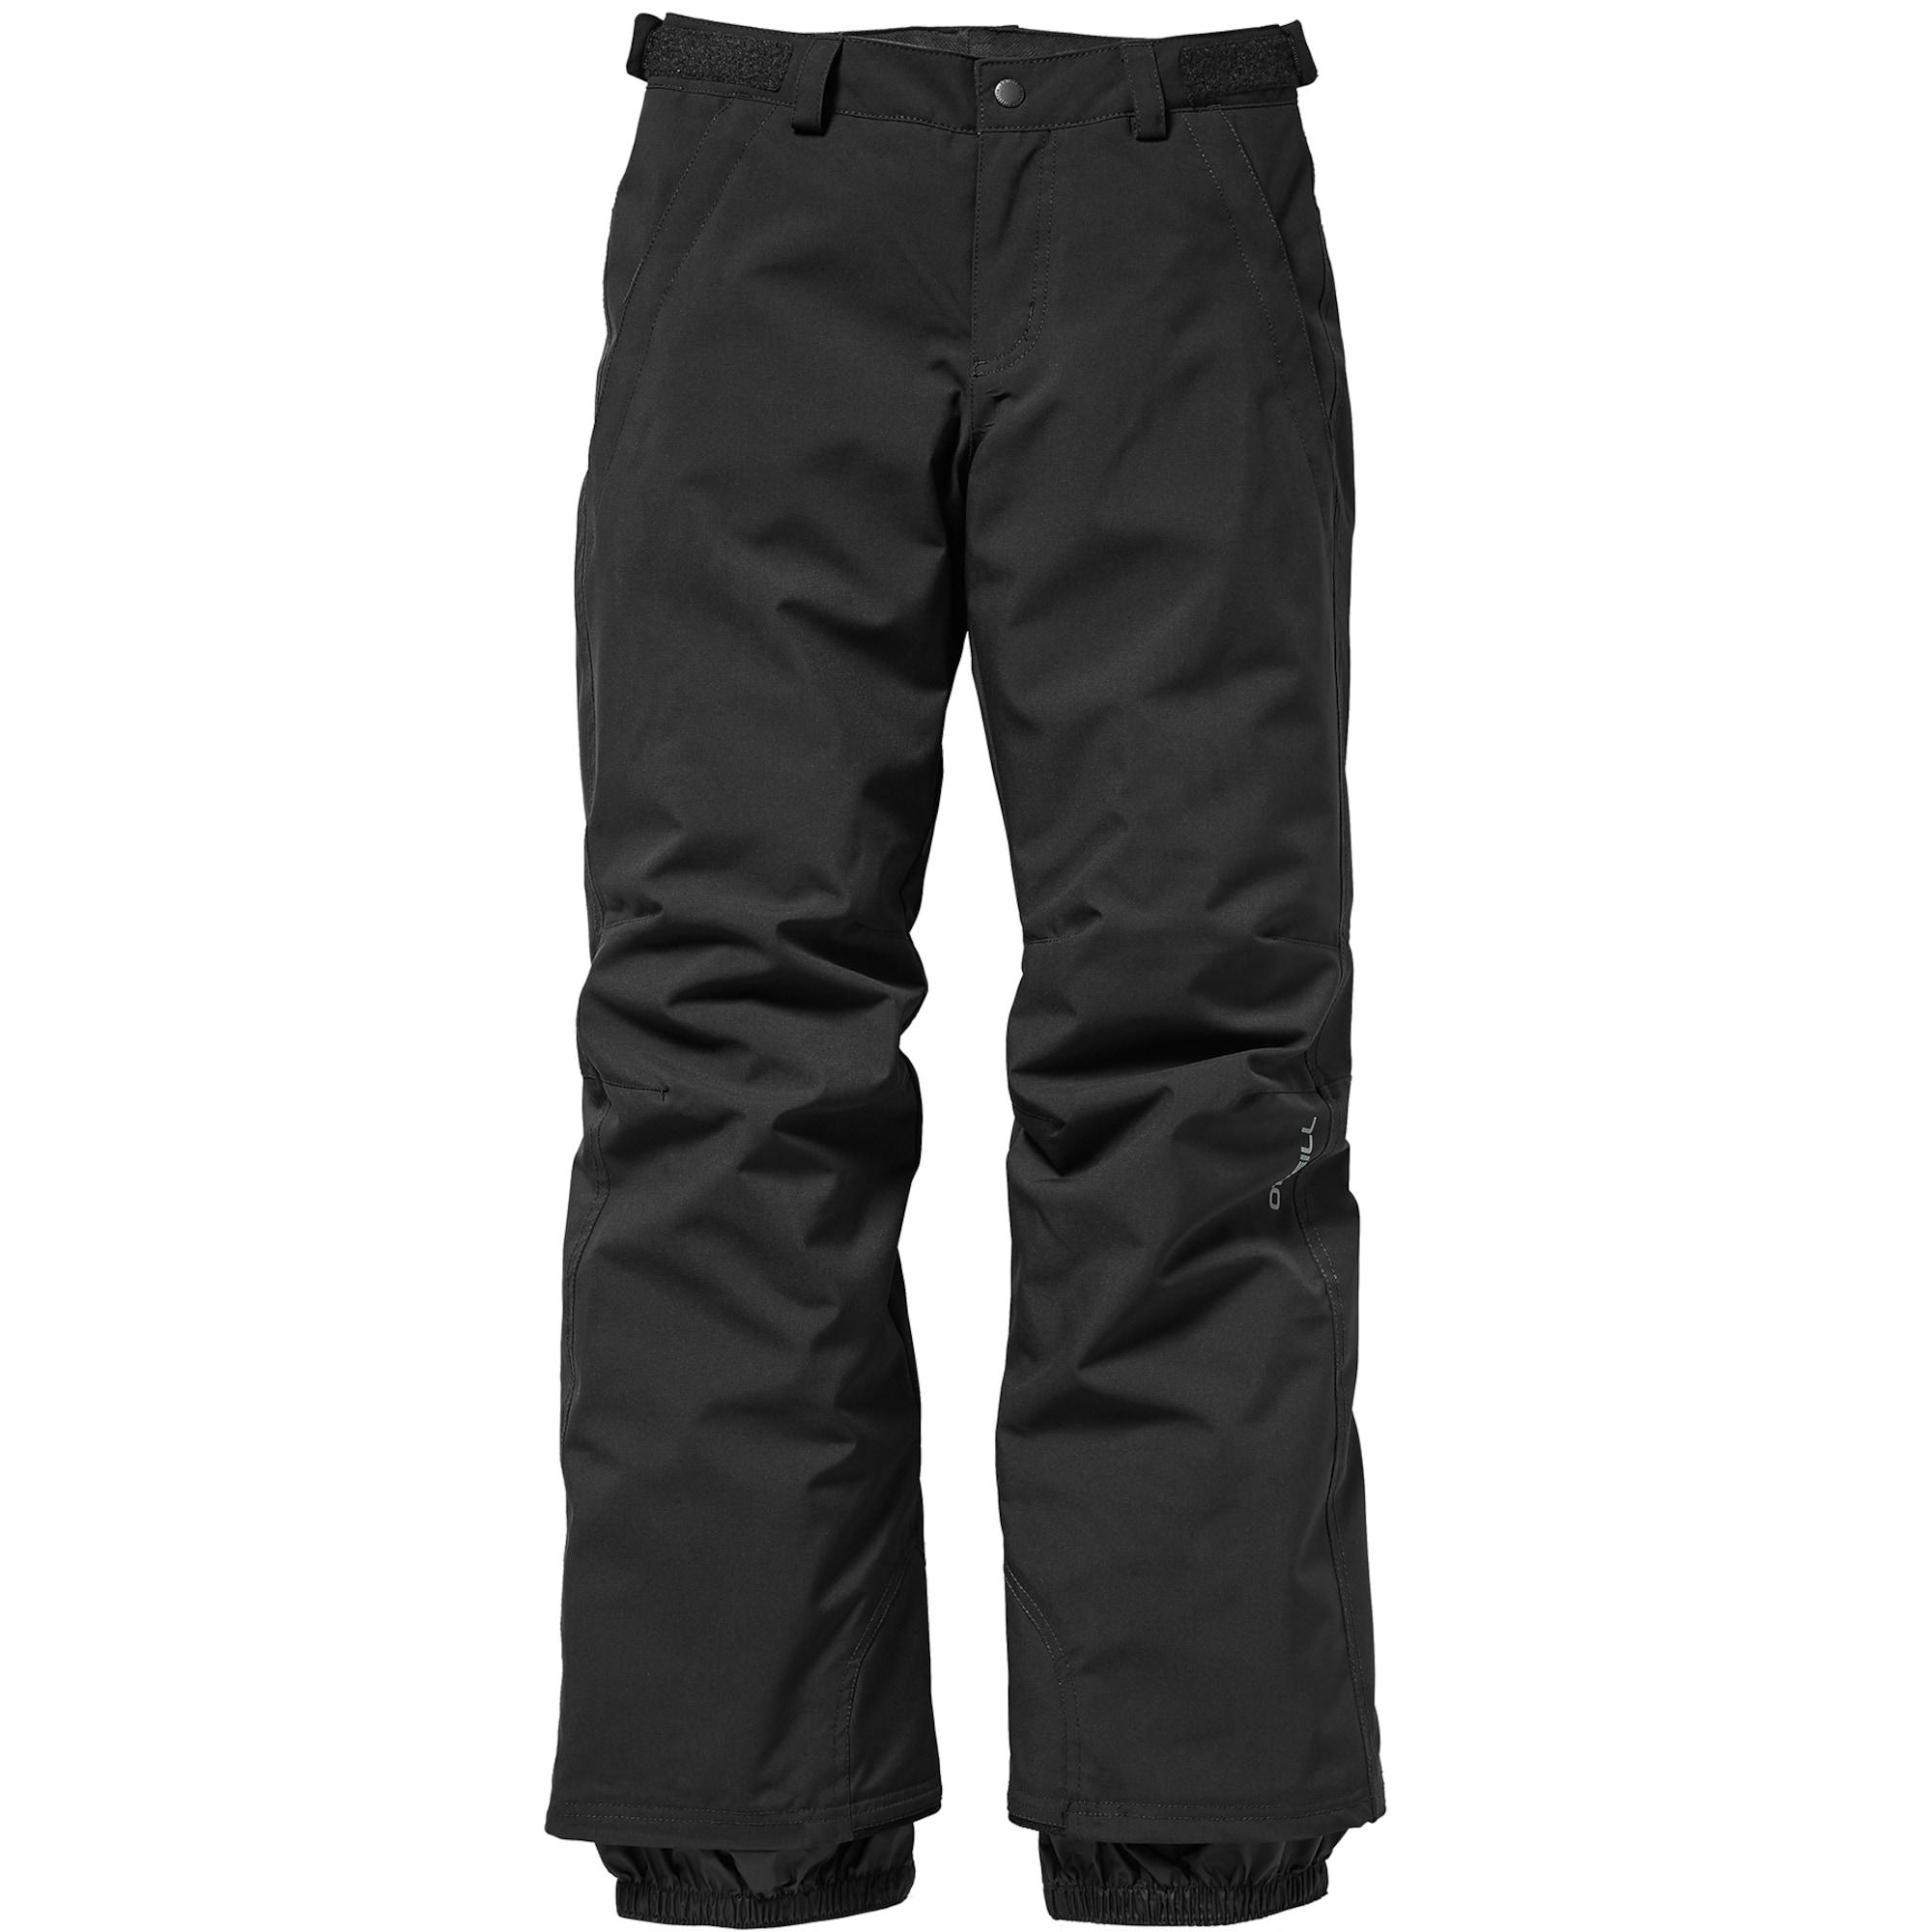 ONEILL Outodoor kalhoty PB ANVIL PANTS černá O'NEILL